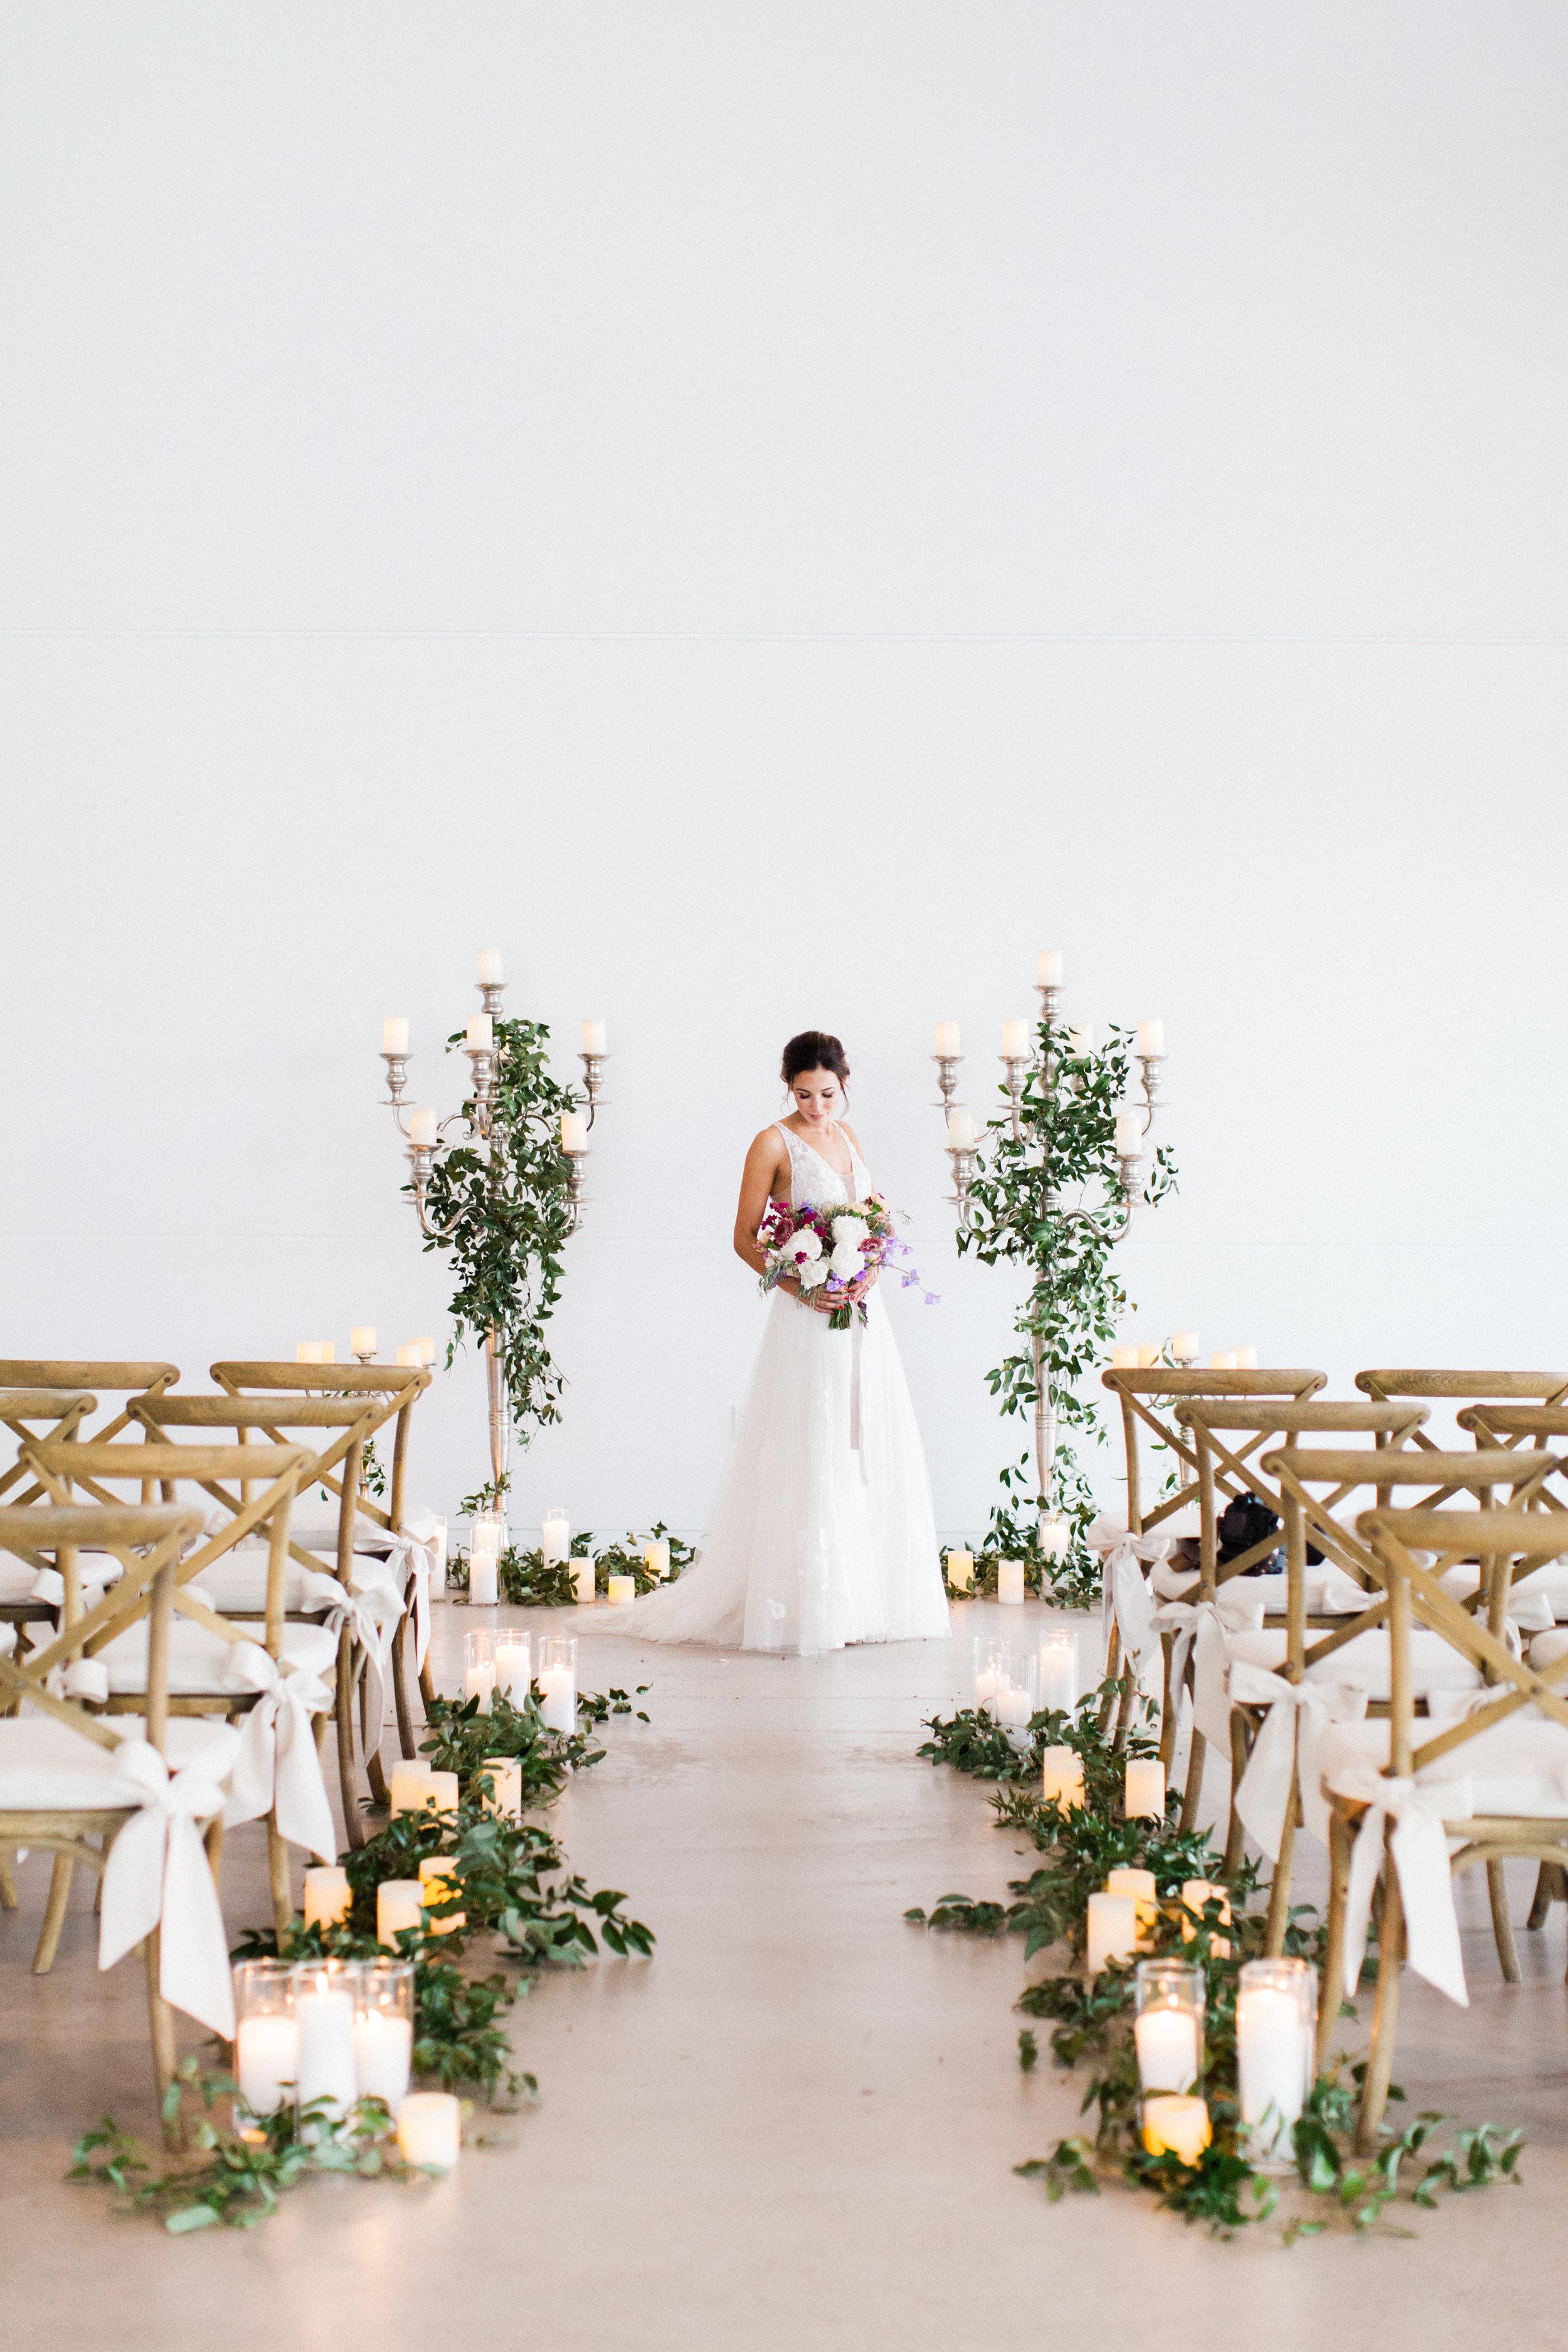 Mauve and Lavender Modern Wedding Inspiration - Ceremony Backdrop